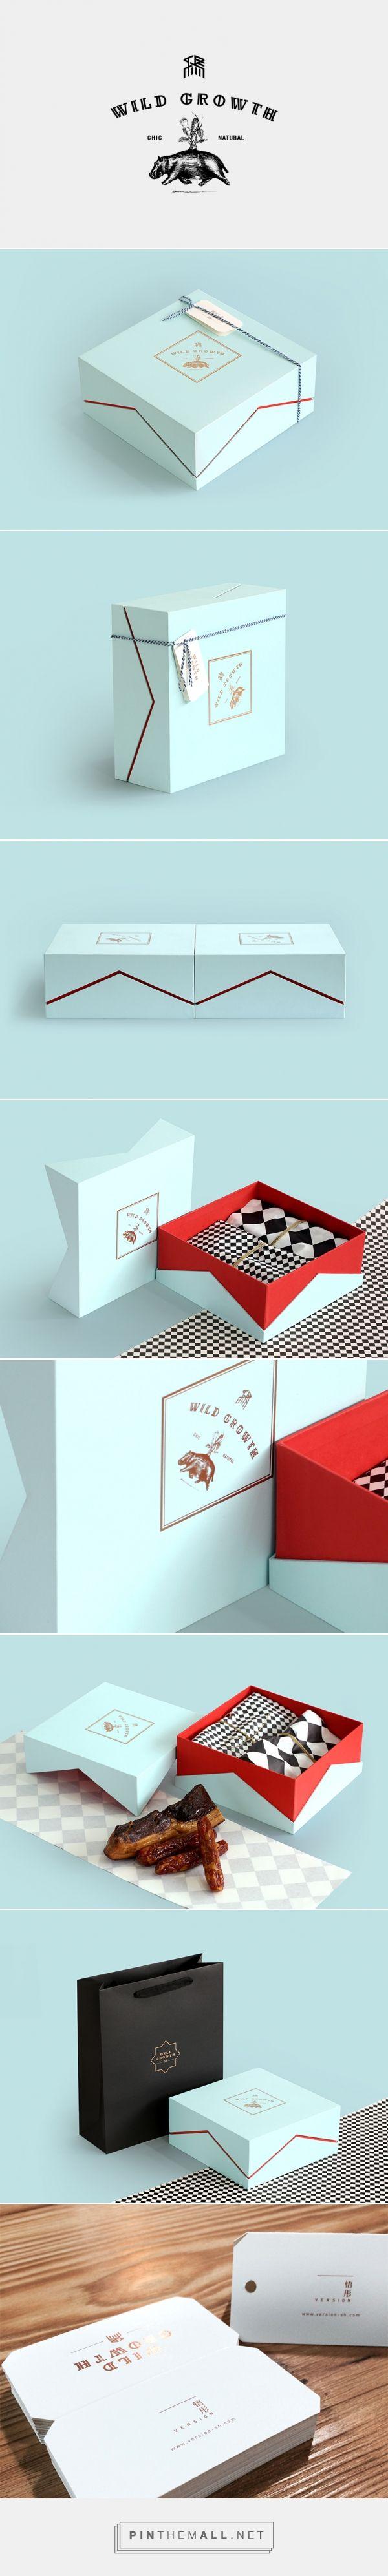 悟形/来自悟形的礼物-古田路9号-福建玖号网络科技有限公司 curated by Packaging Diva PD. Love this unique packaging design for Wild Growth meat.